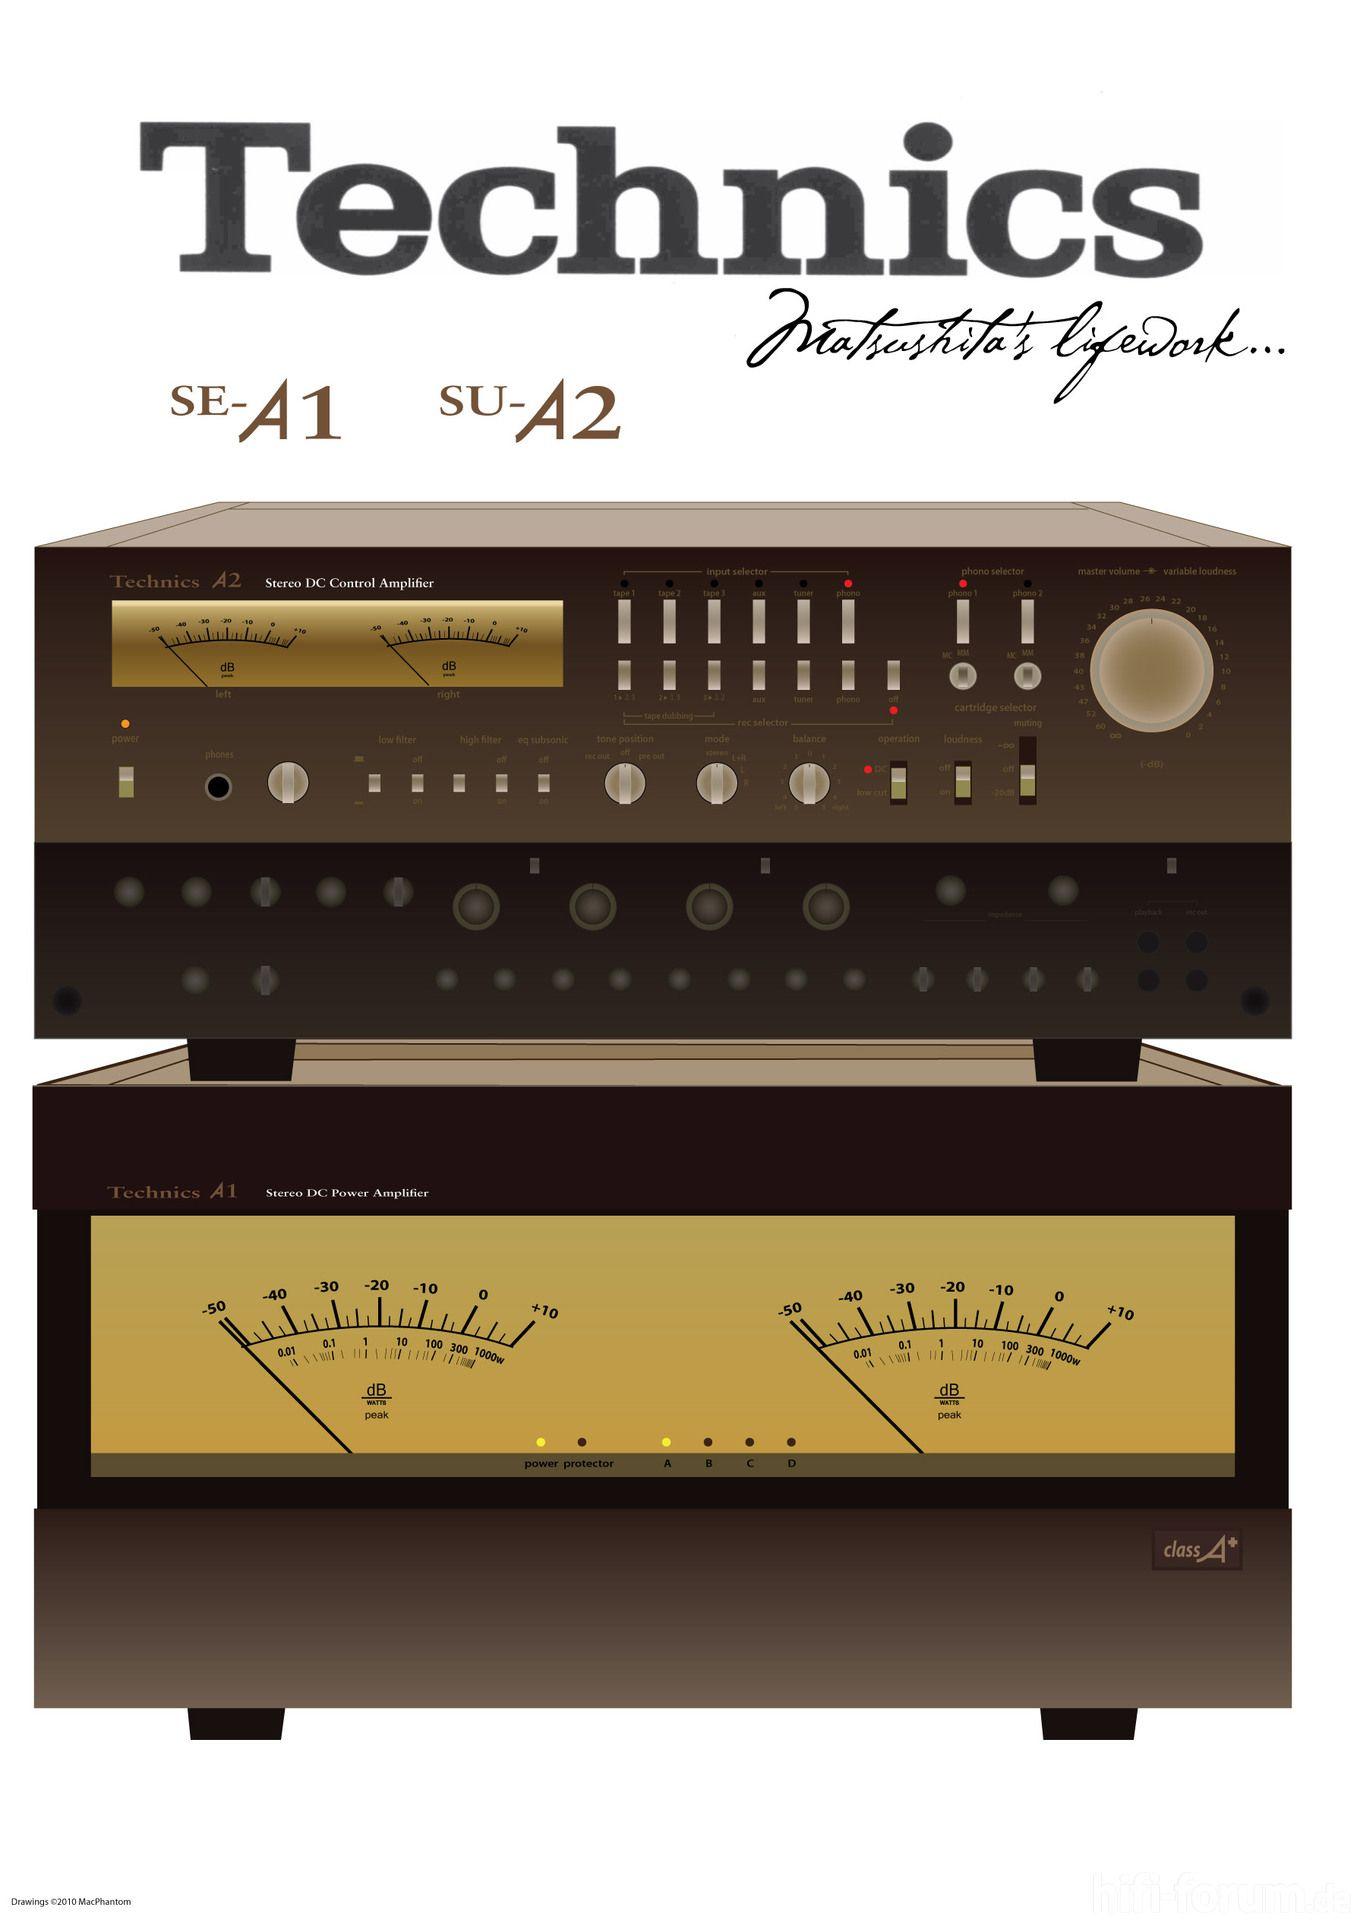 Pin by Antonio Rodriguez on wepa   Hifi audio, Audio ...